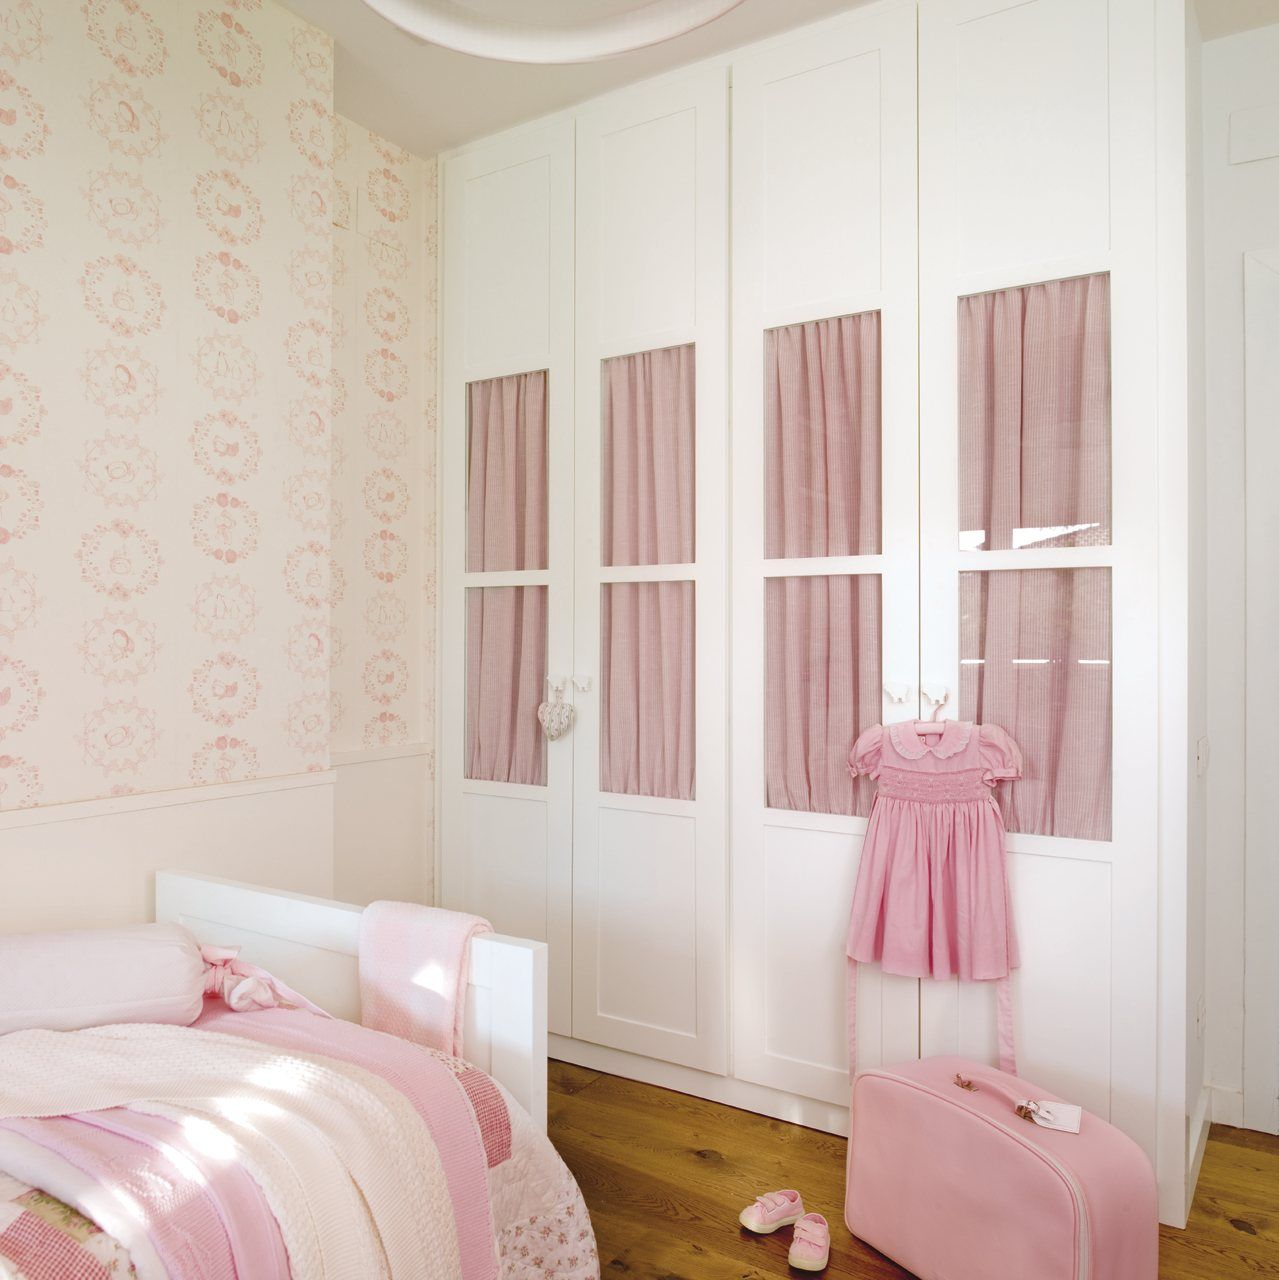 Armario Habitacion Niña ~ Maxi ideas para mini habitaciones u00b7 ElMueble com u00b7 Niños Cuarto de Niños Pinterest